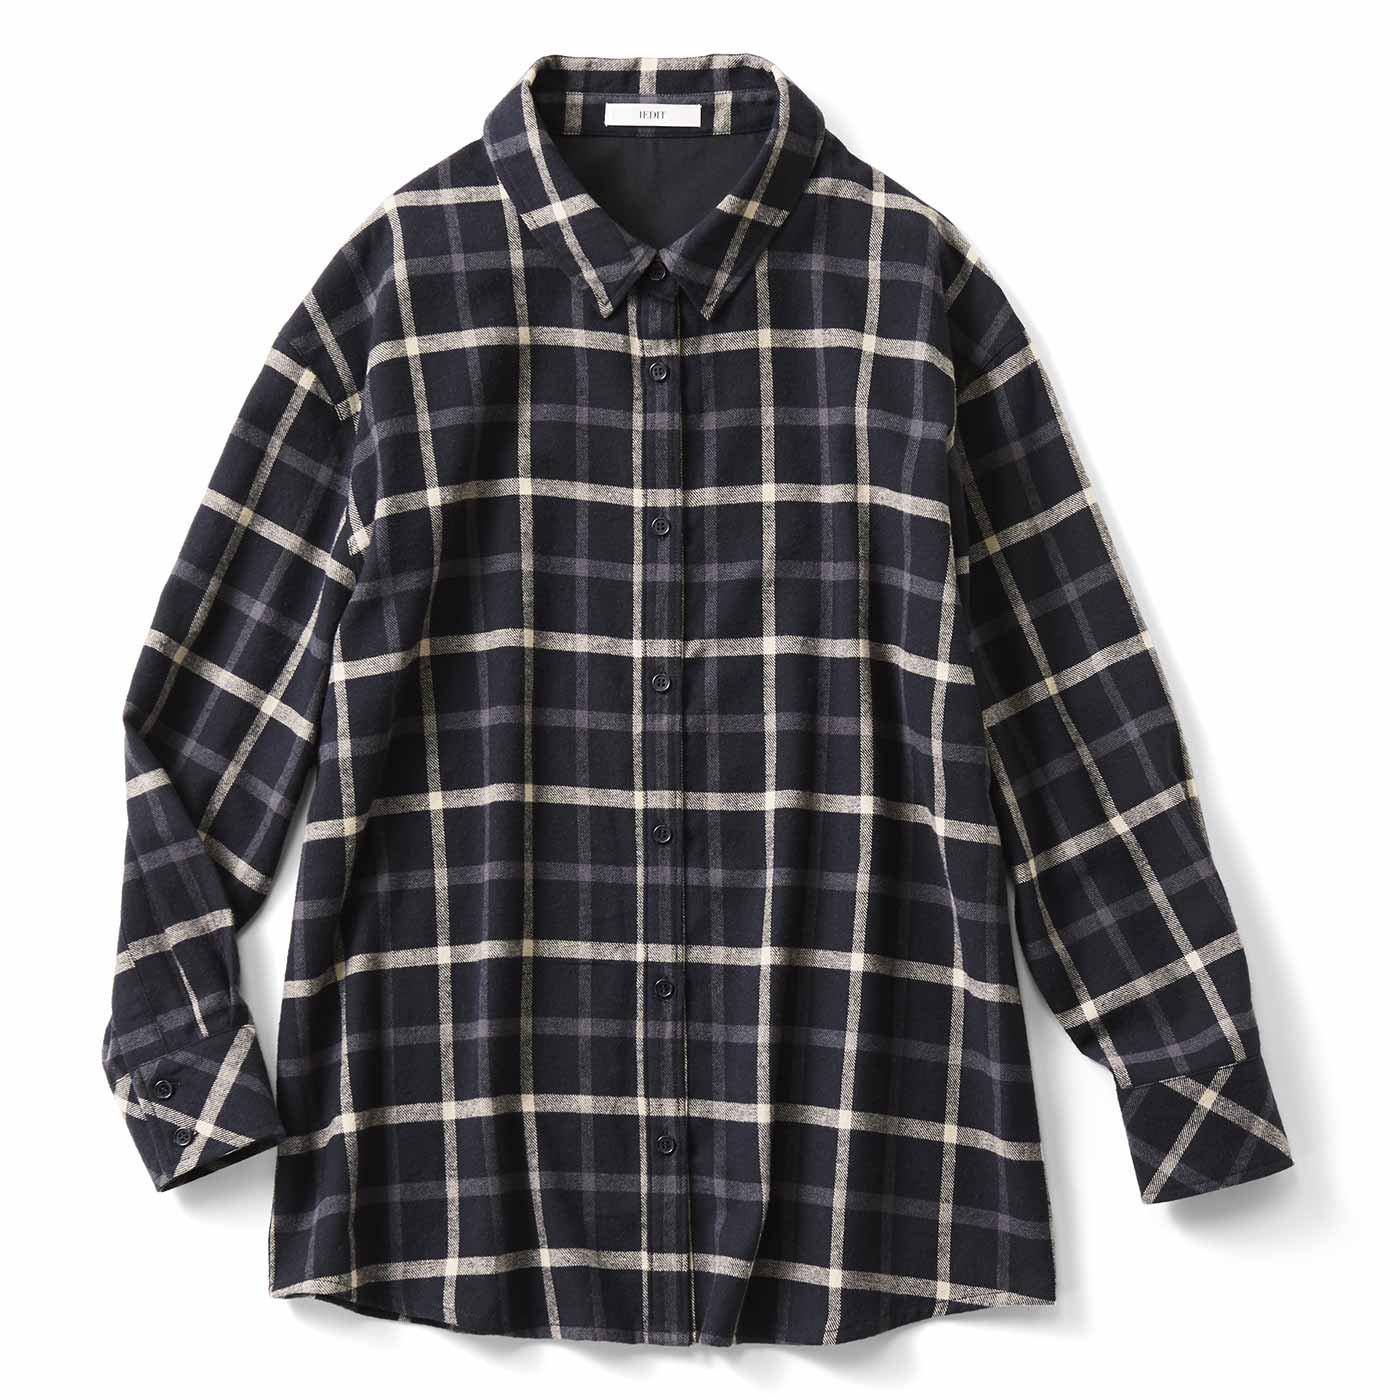 IEDIT[イディット] 大人シックなやわらかチェックシャツチュニック〈ブラック〉